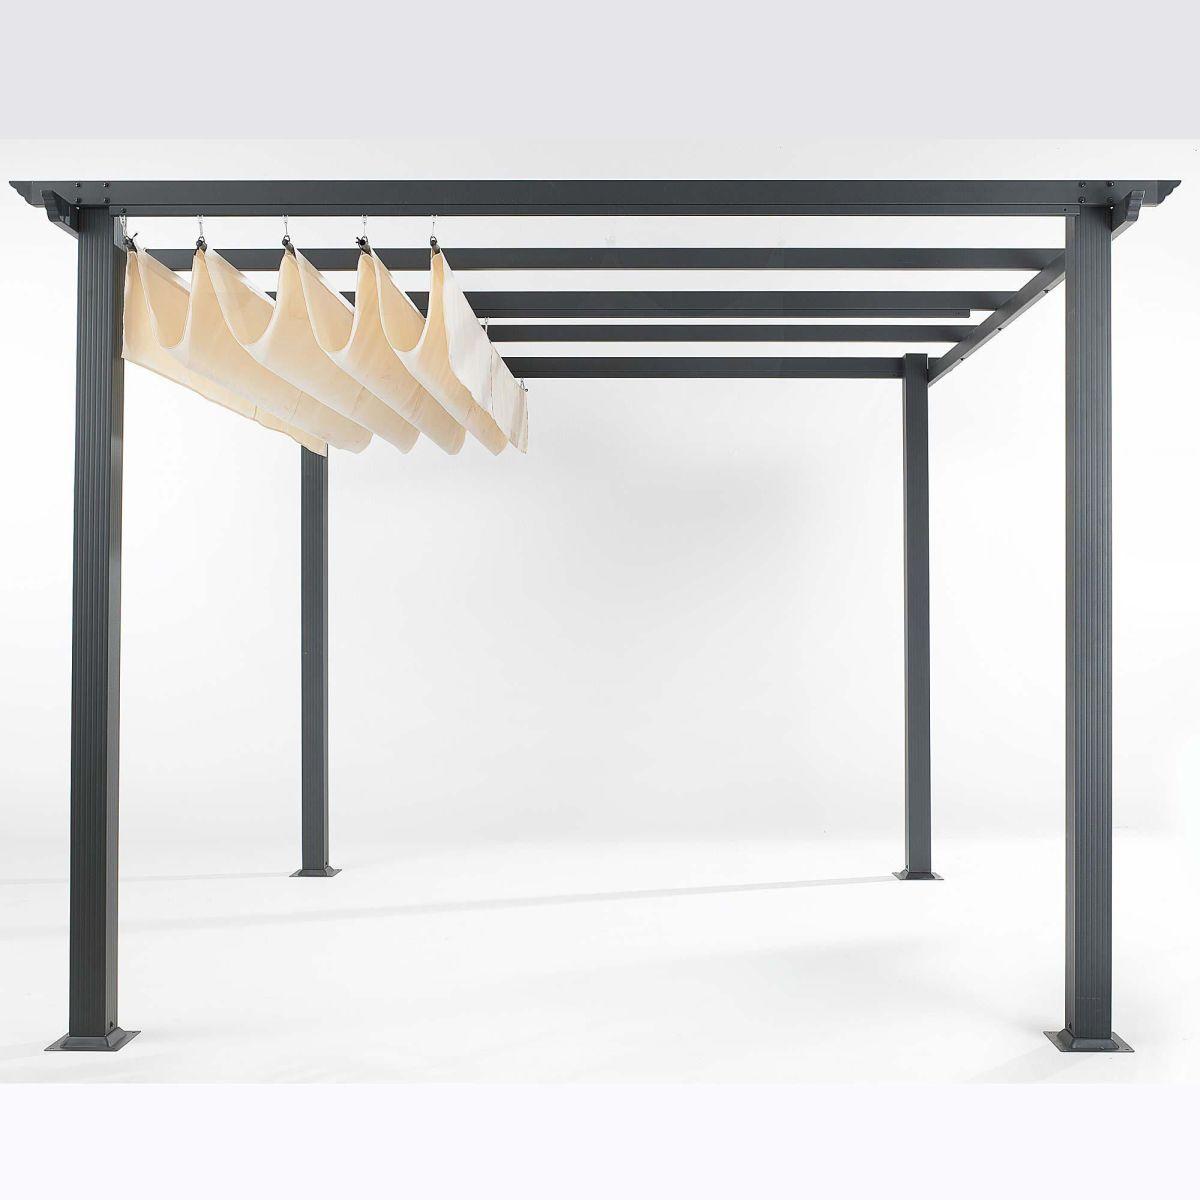 Design-Pergola pulverbeschichtetes Aluminium Dach 100 Polyester